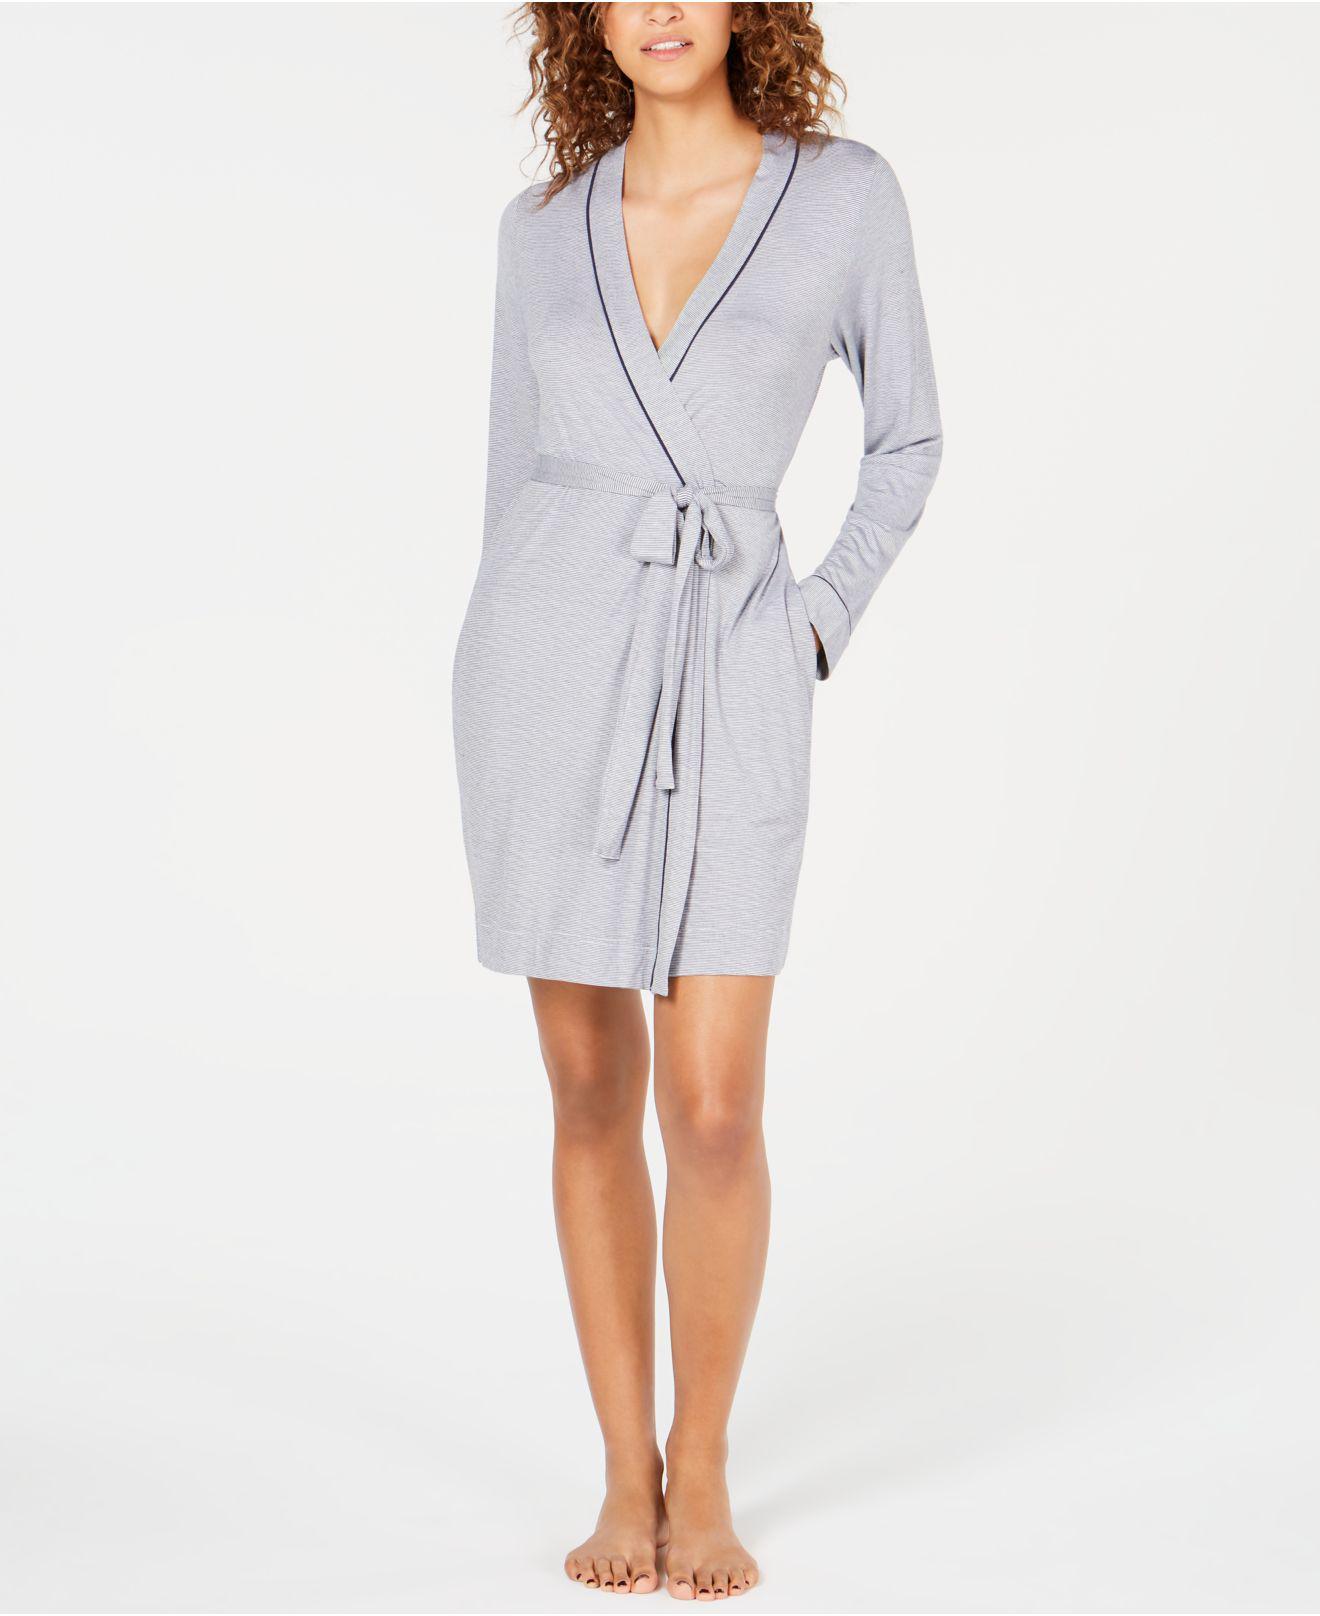 acf0d4d3d4 Lyst - UGG Aldridge Mini-striped Knit Wrap Robe in Blue